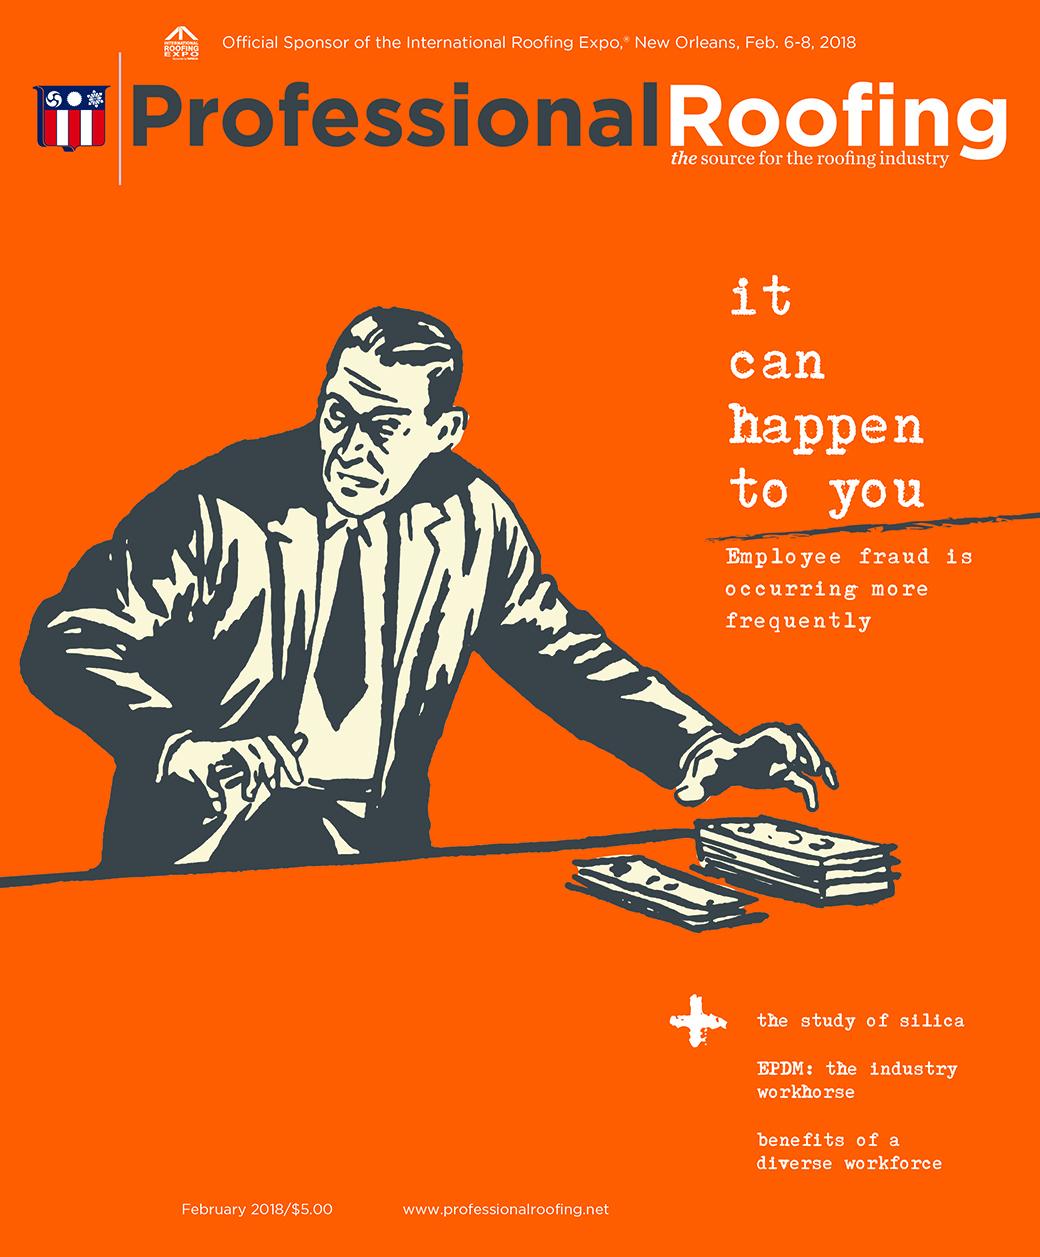 Professional Roofing Magazine 2/1/2018